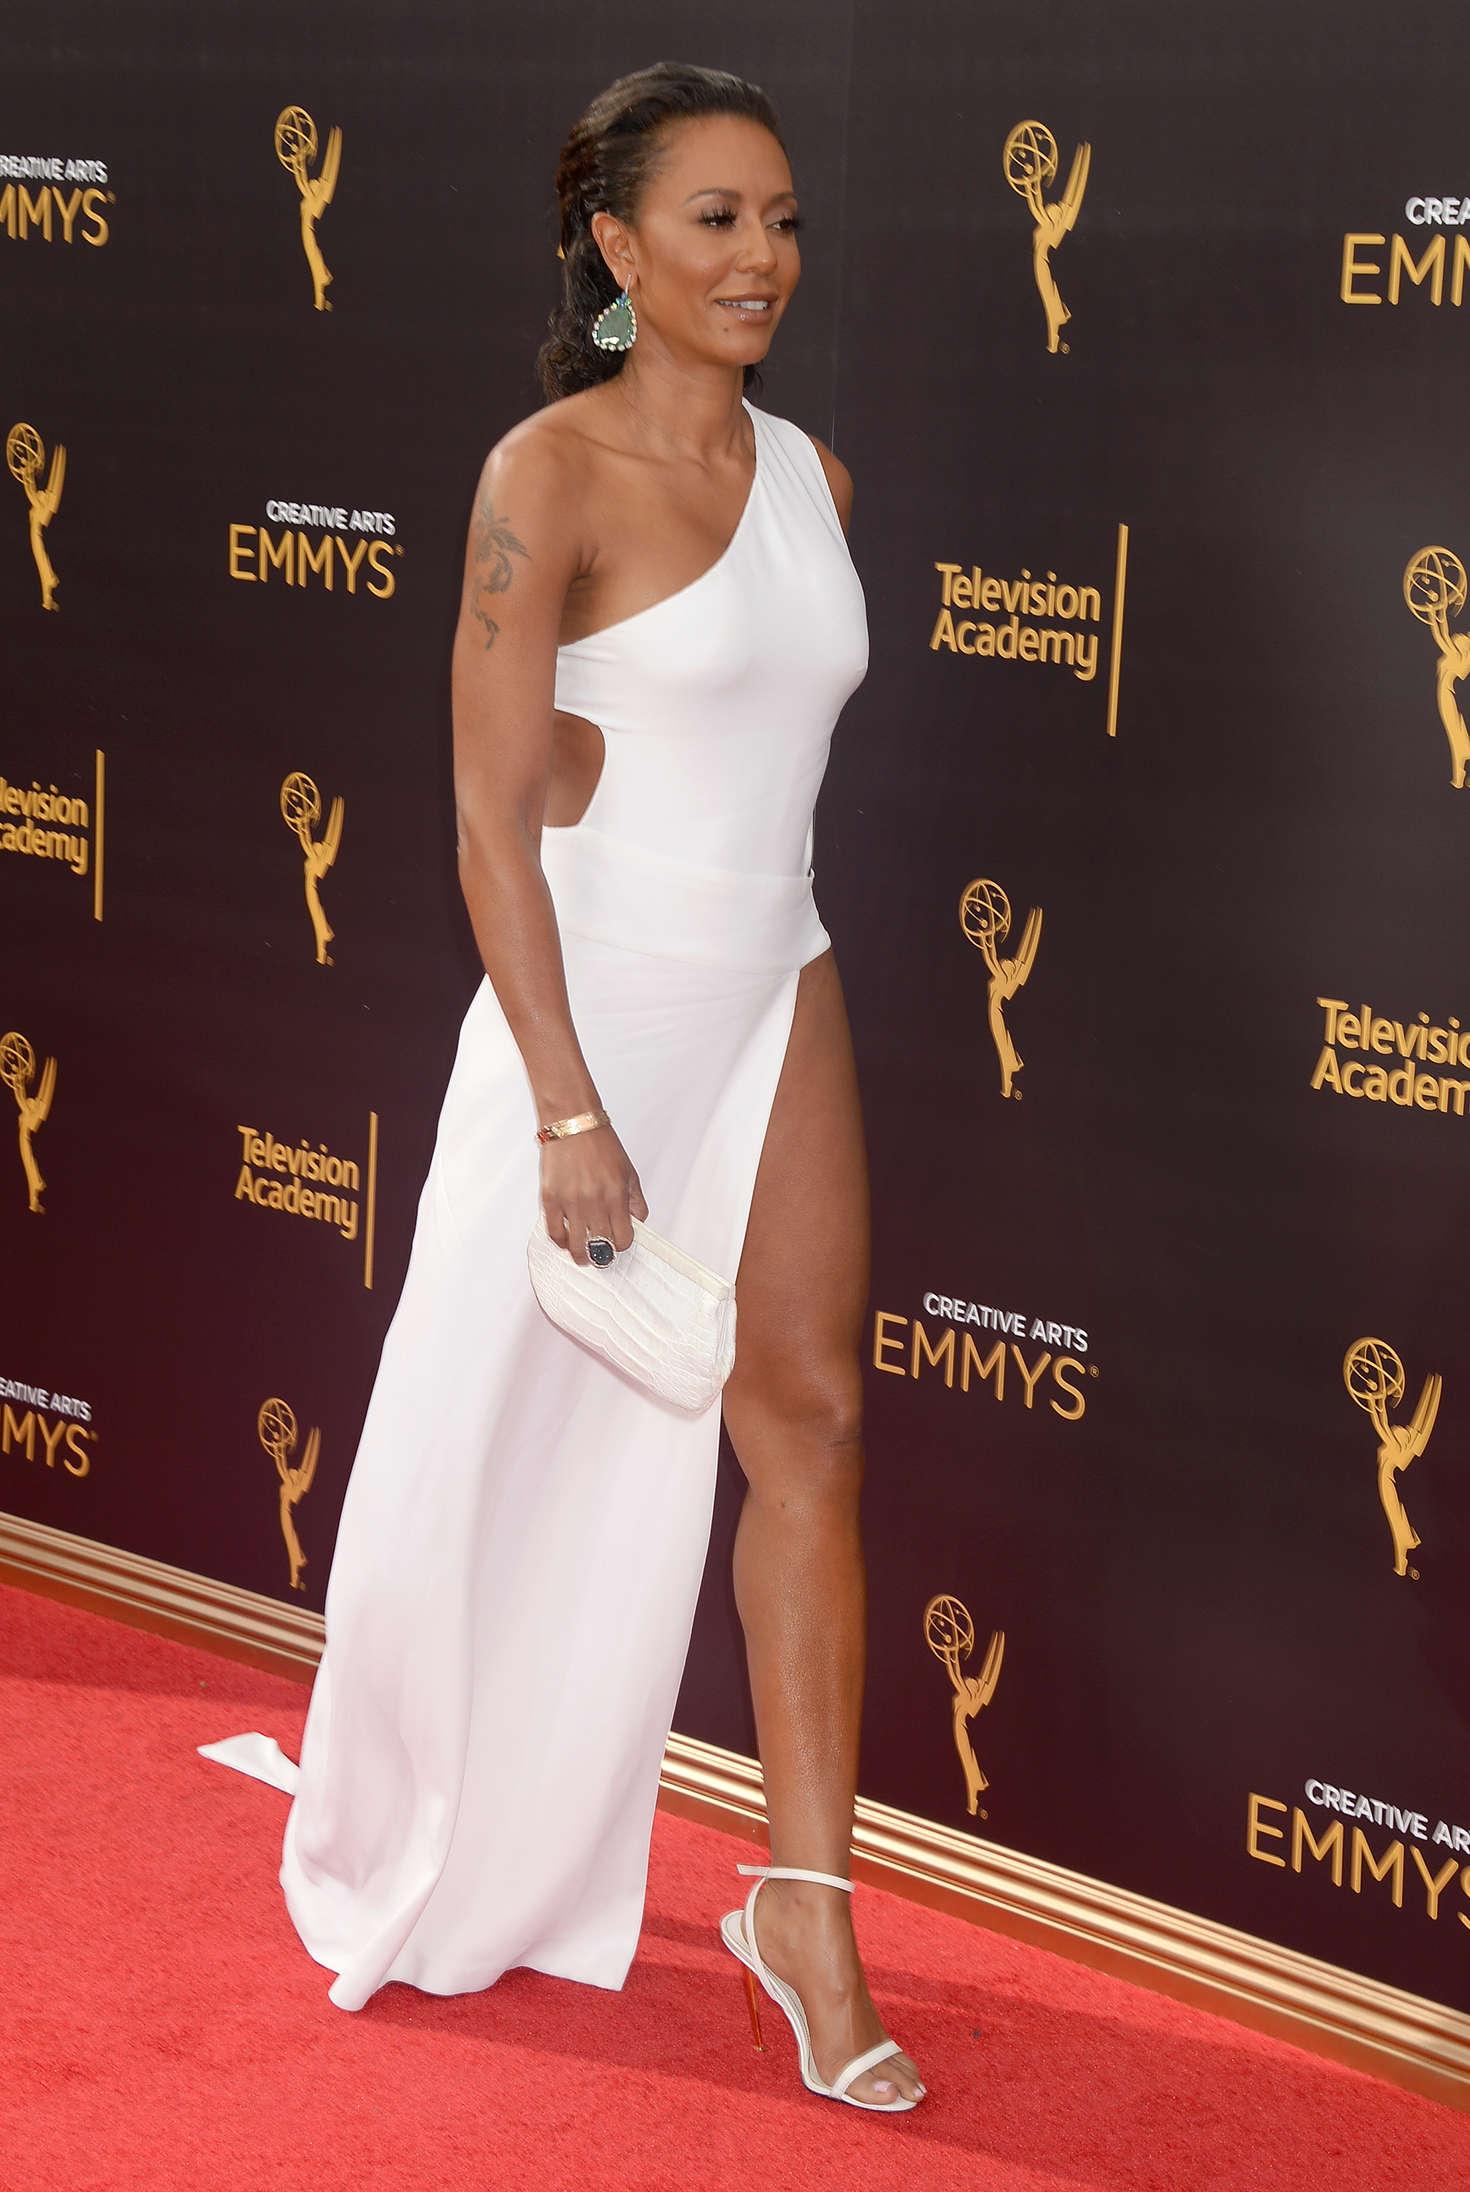 Melanie Brown Creative Arts Emmy Awards 2016 20 Gotceleb